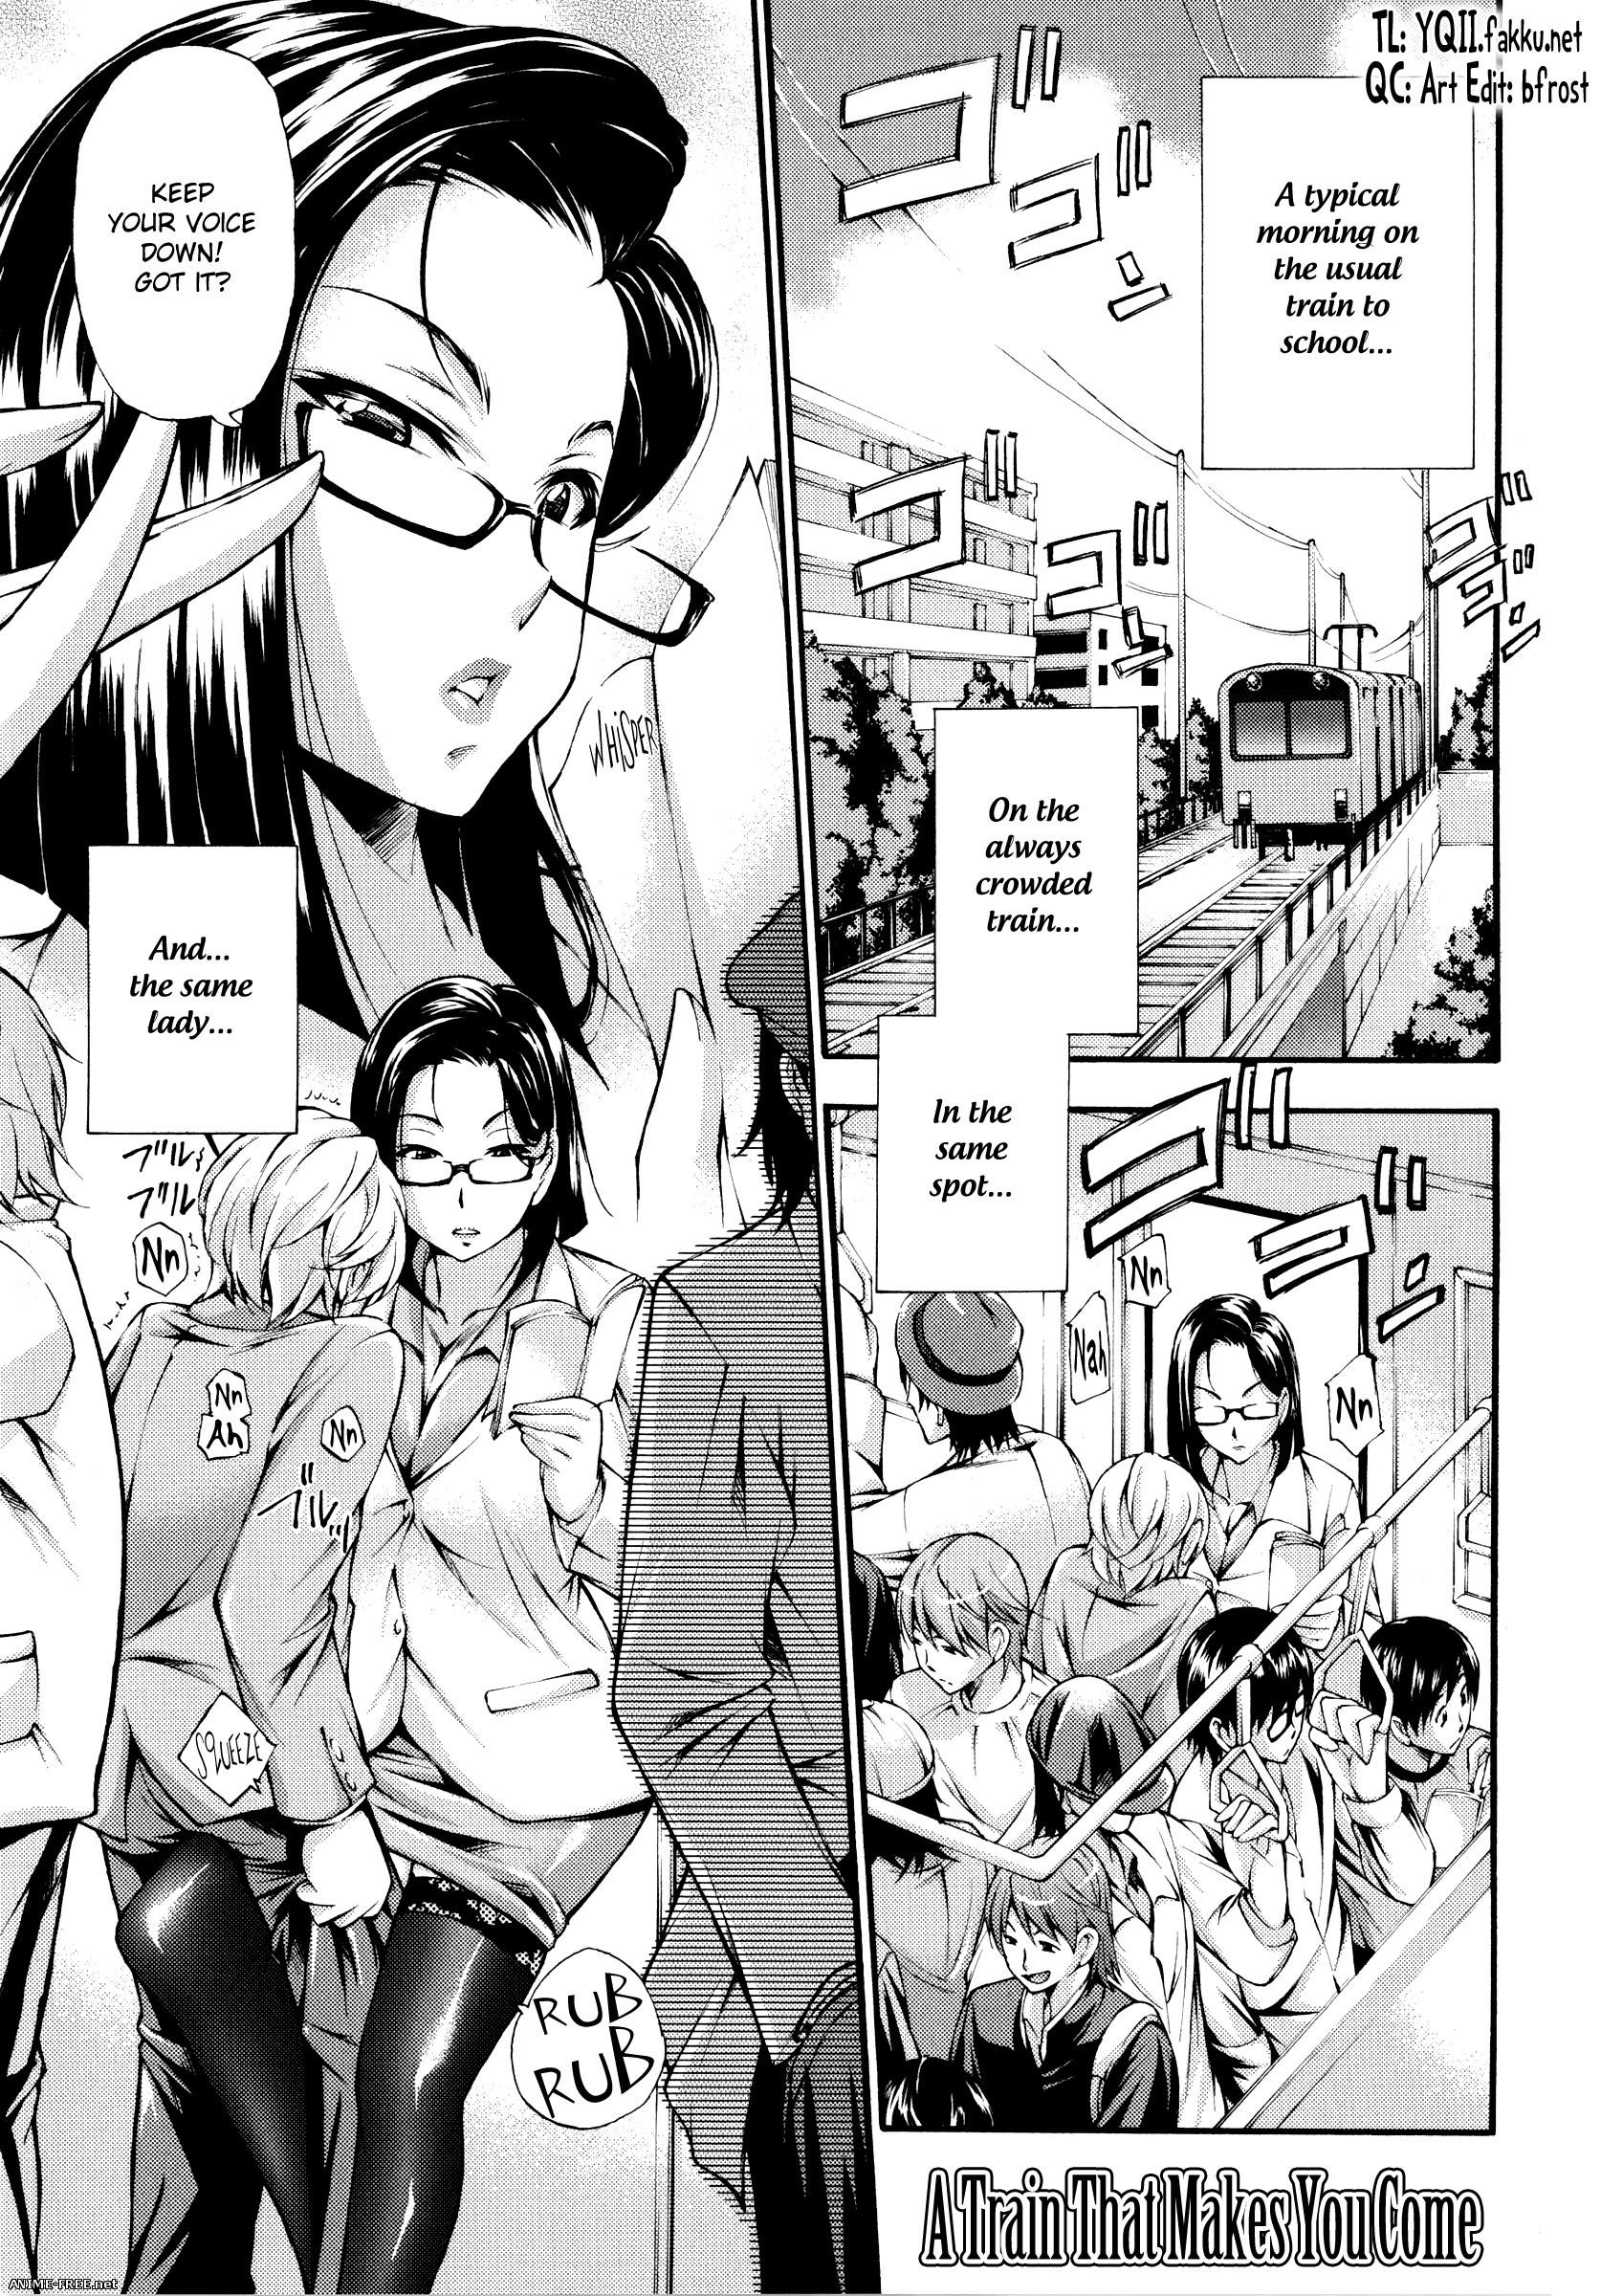 Nakata Modem - Сборник хентай манги [Ptcen] [RUS,ENG,JAP,CHI] Manga Hentai